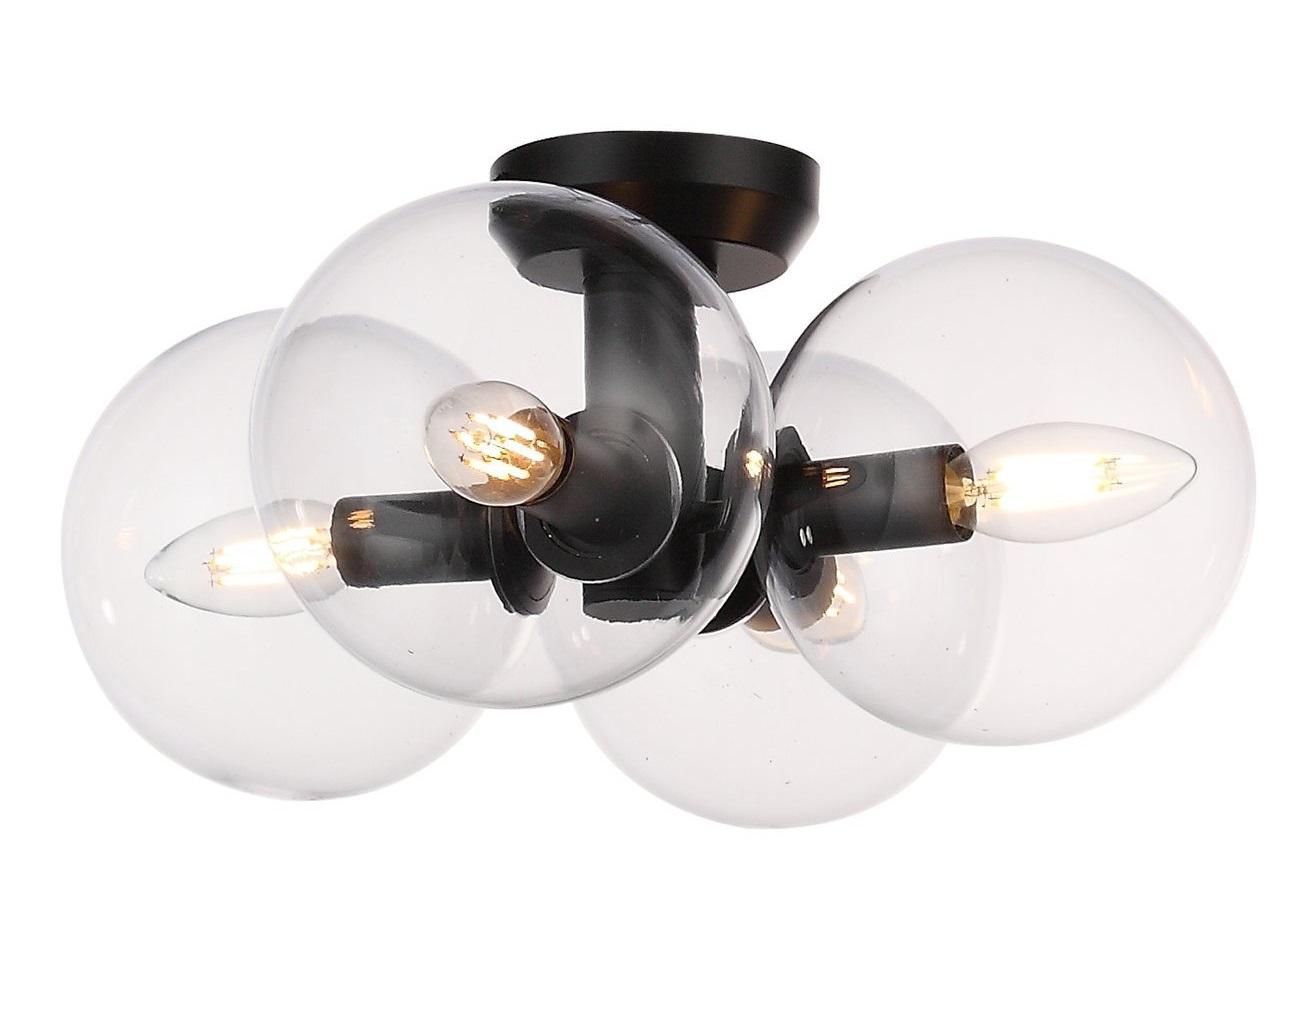 Люстра потолочная rosello (st luce) прозрачный